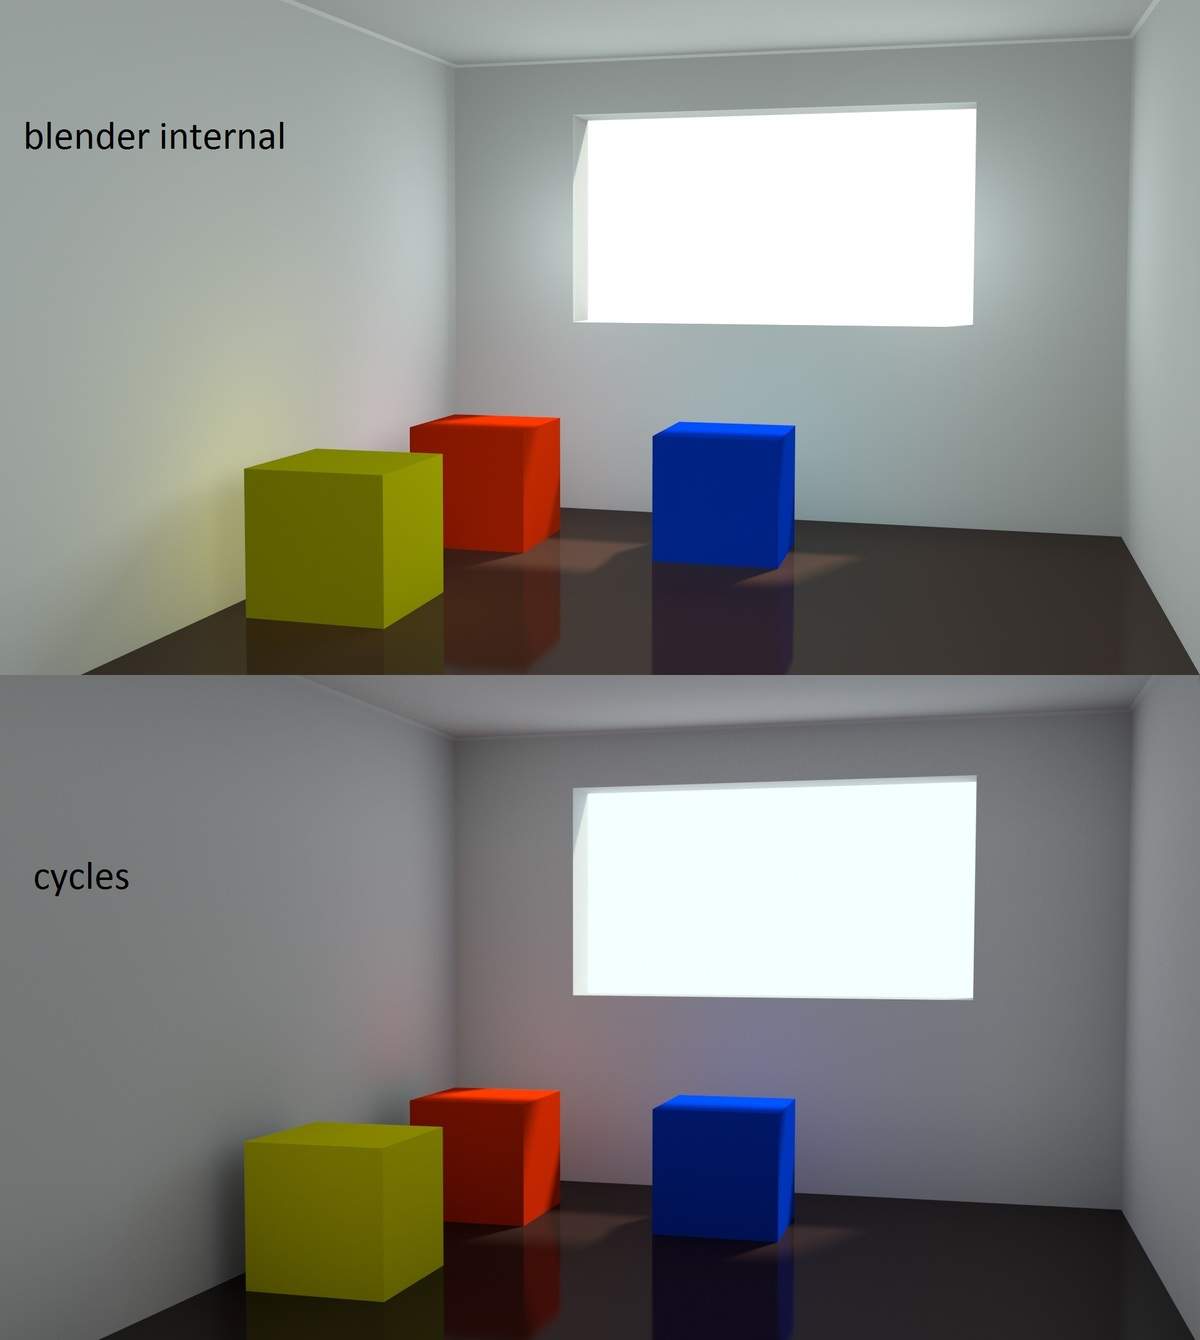 Blender Internal vs Cycles